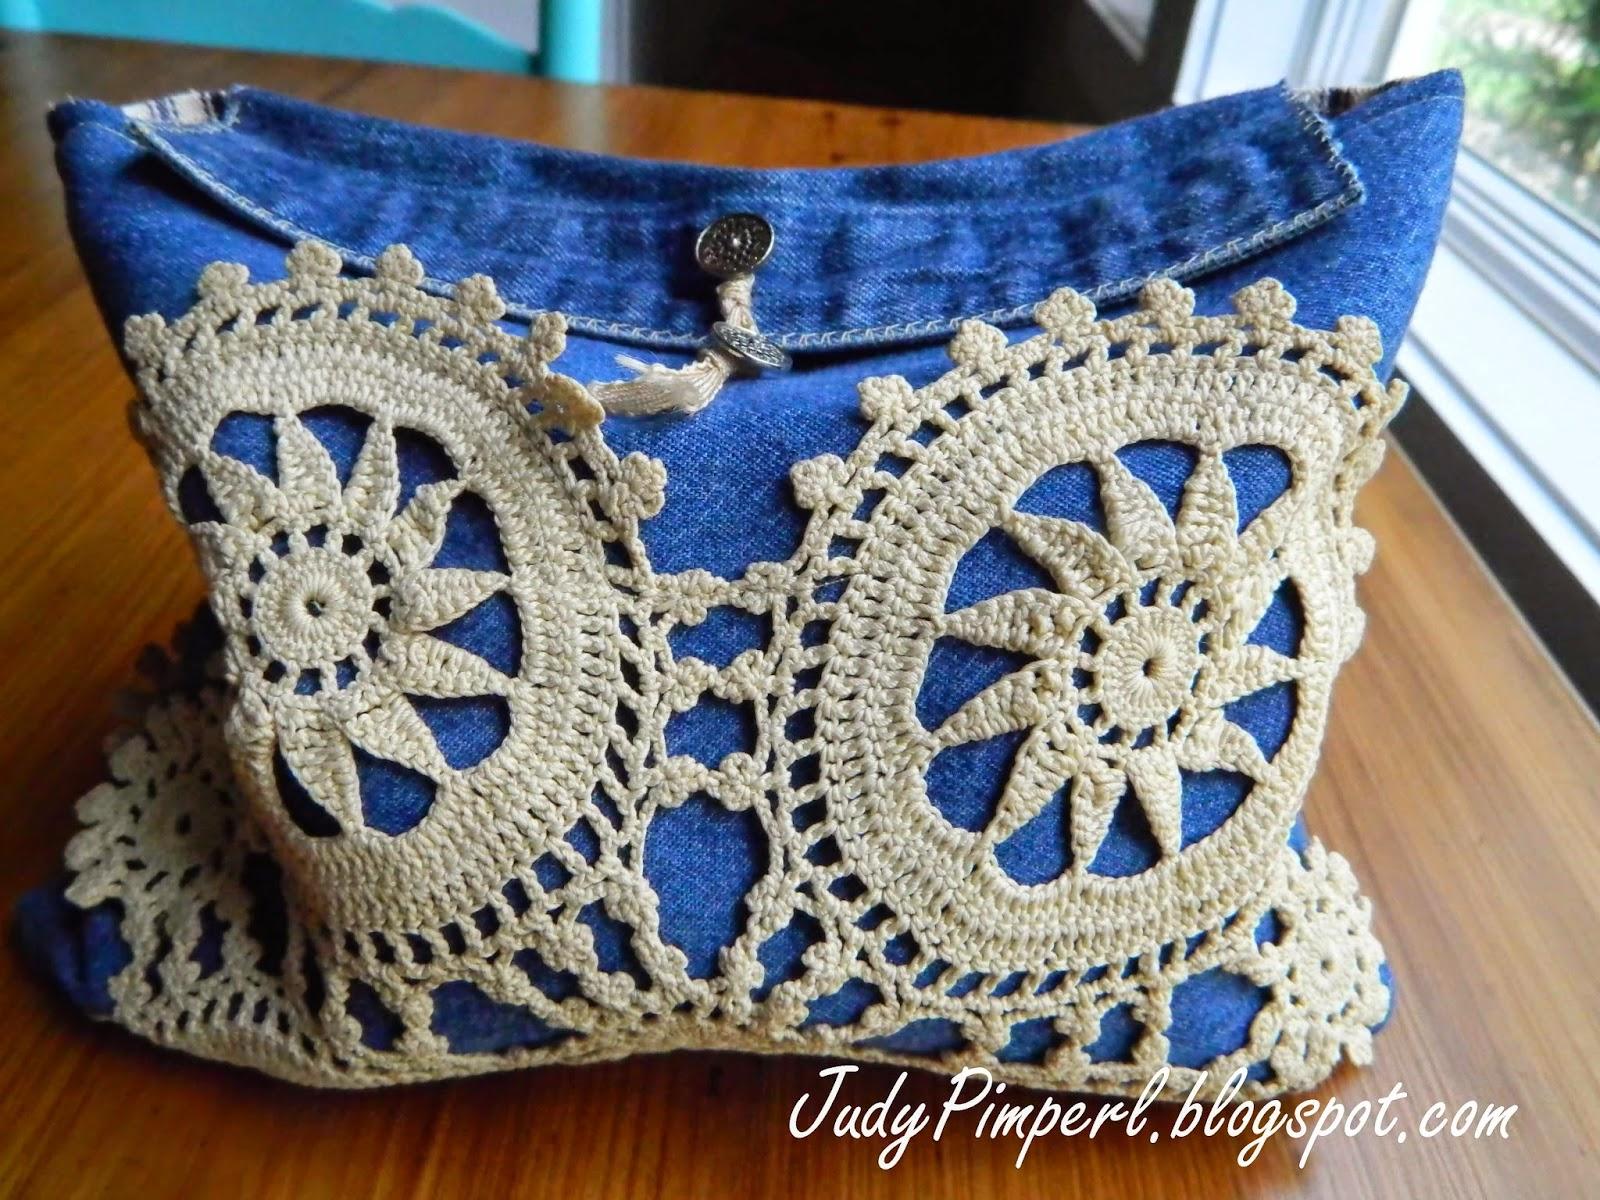 Judy hanks pimperl diy upcycled denim bag for random for Random diys